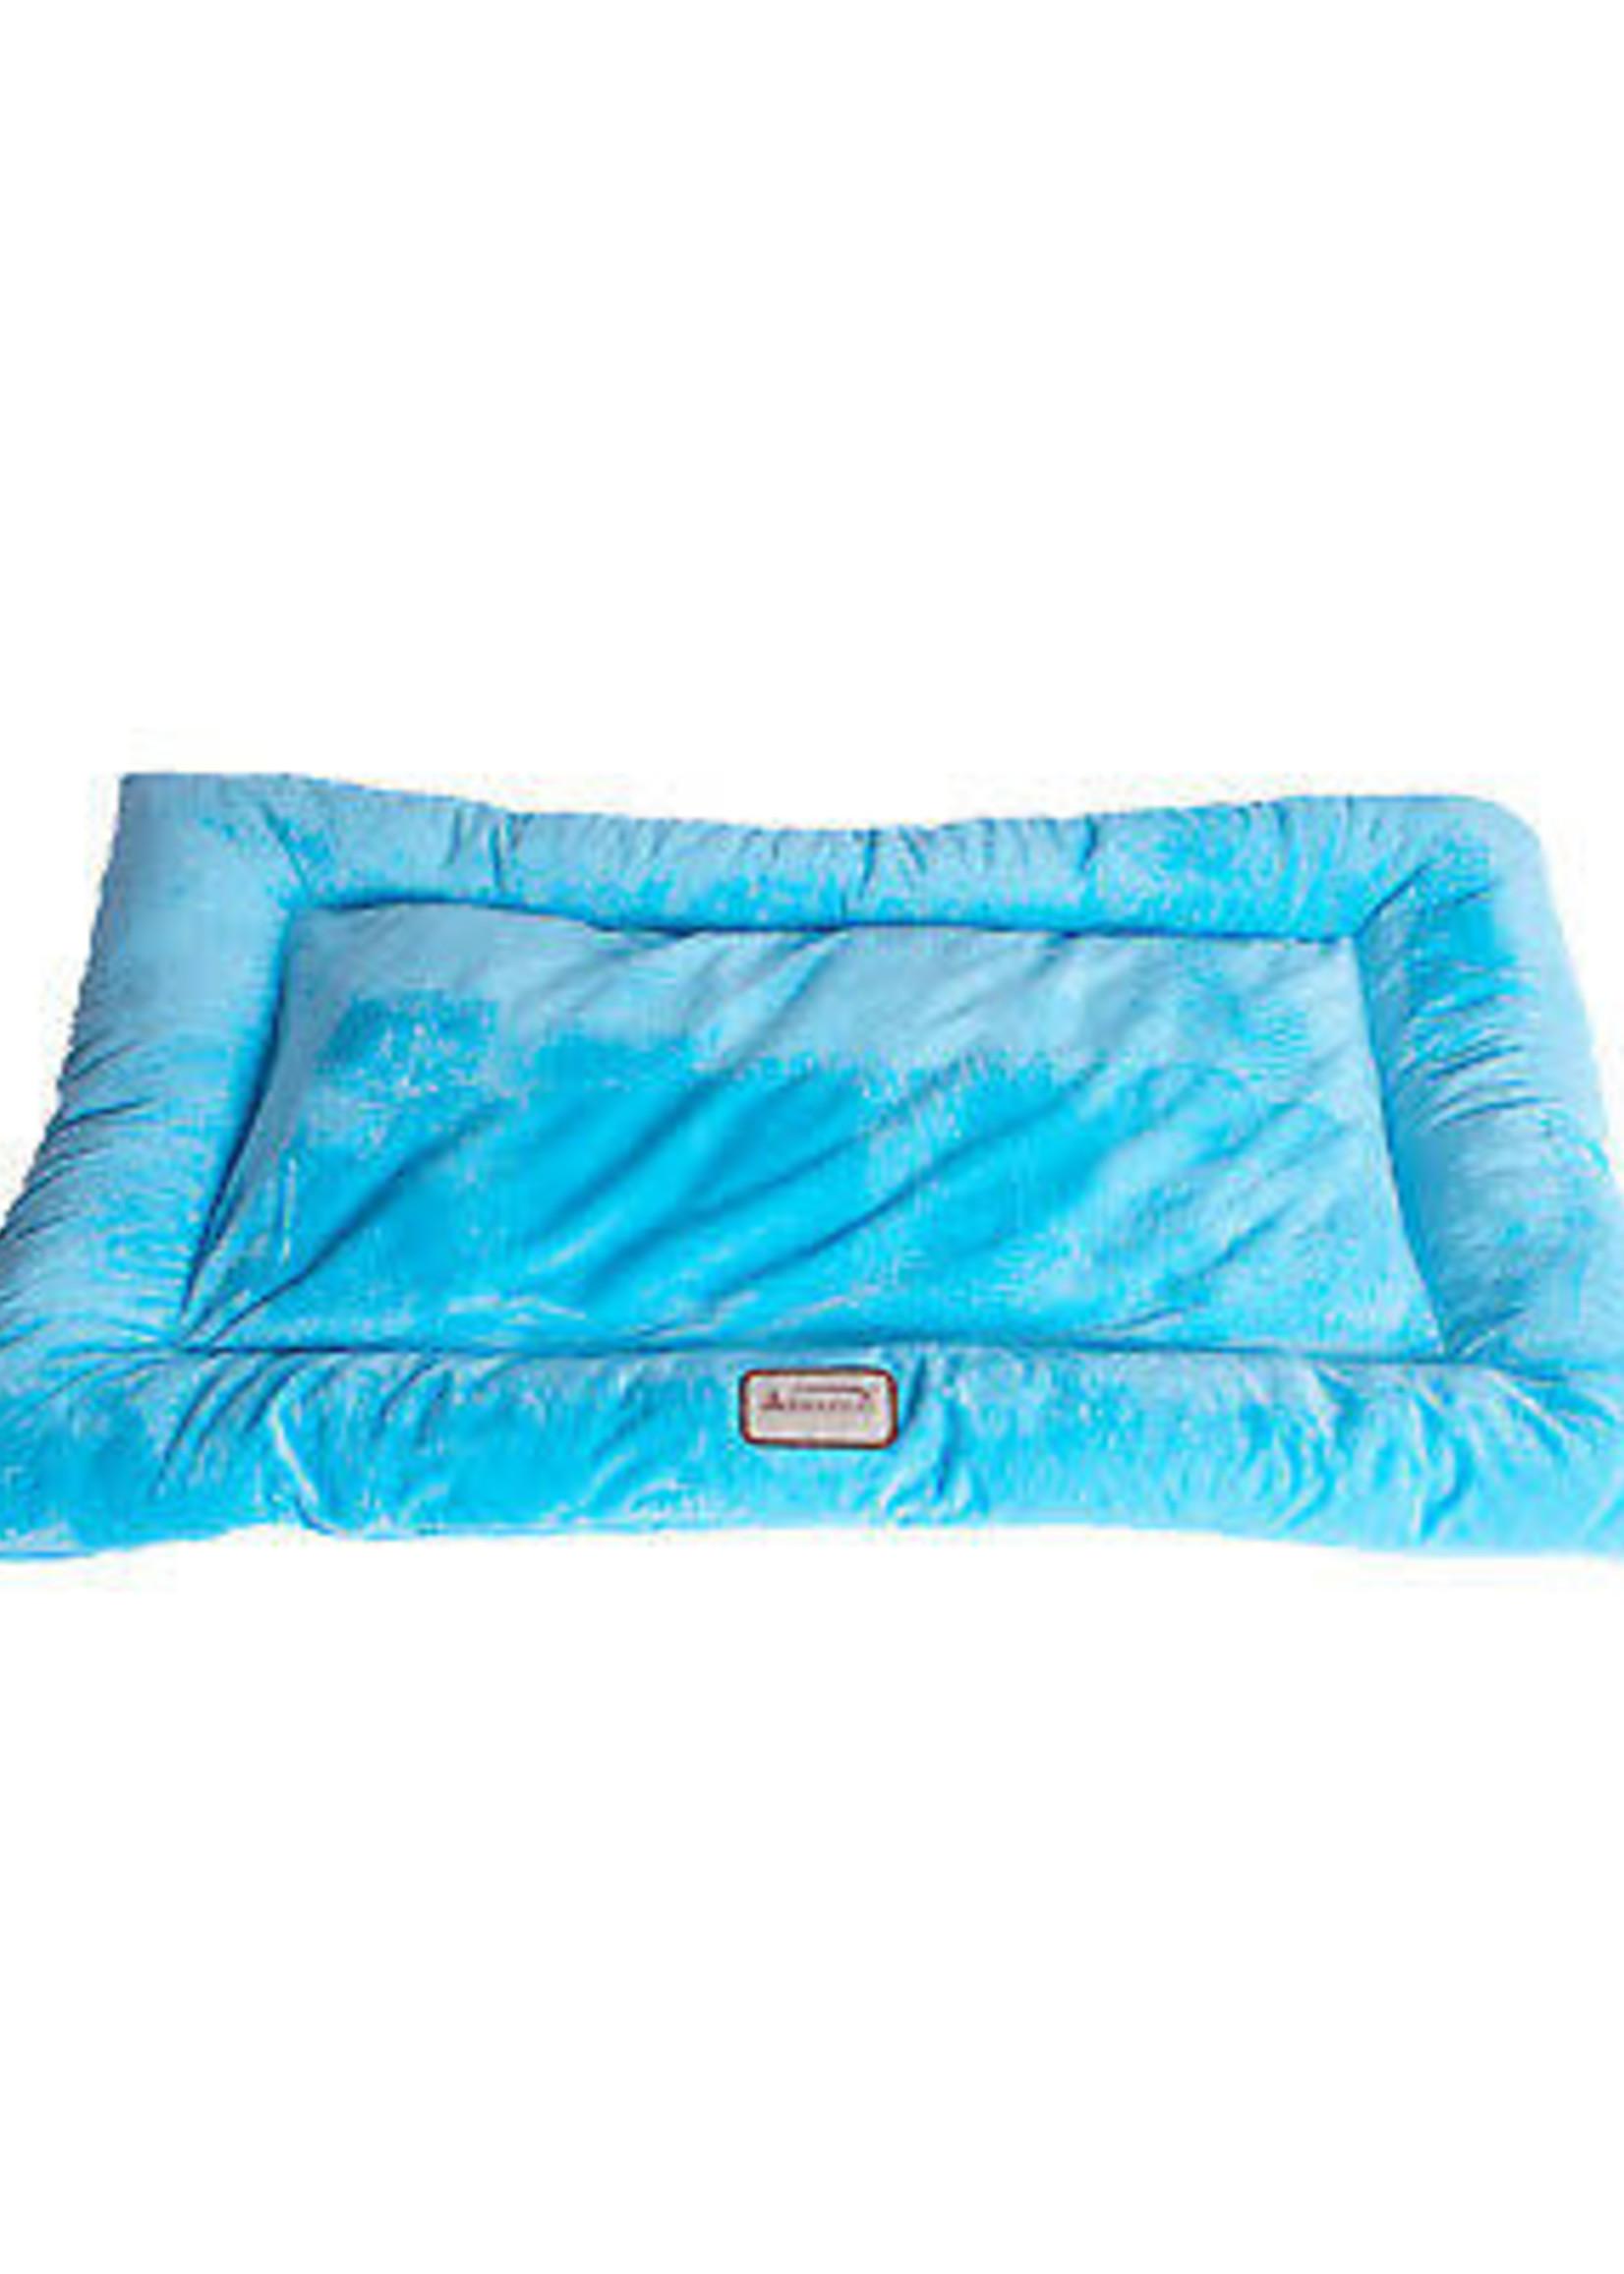 Armarkat Armarkat Med Dog Crate Soft Pad Mat w/Poly Fill Cushion Sky Blue